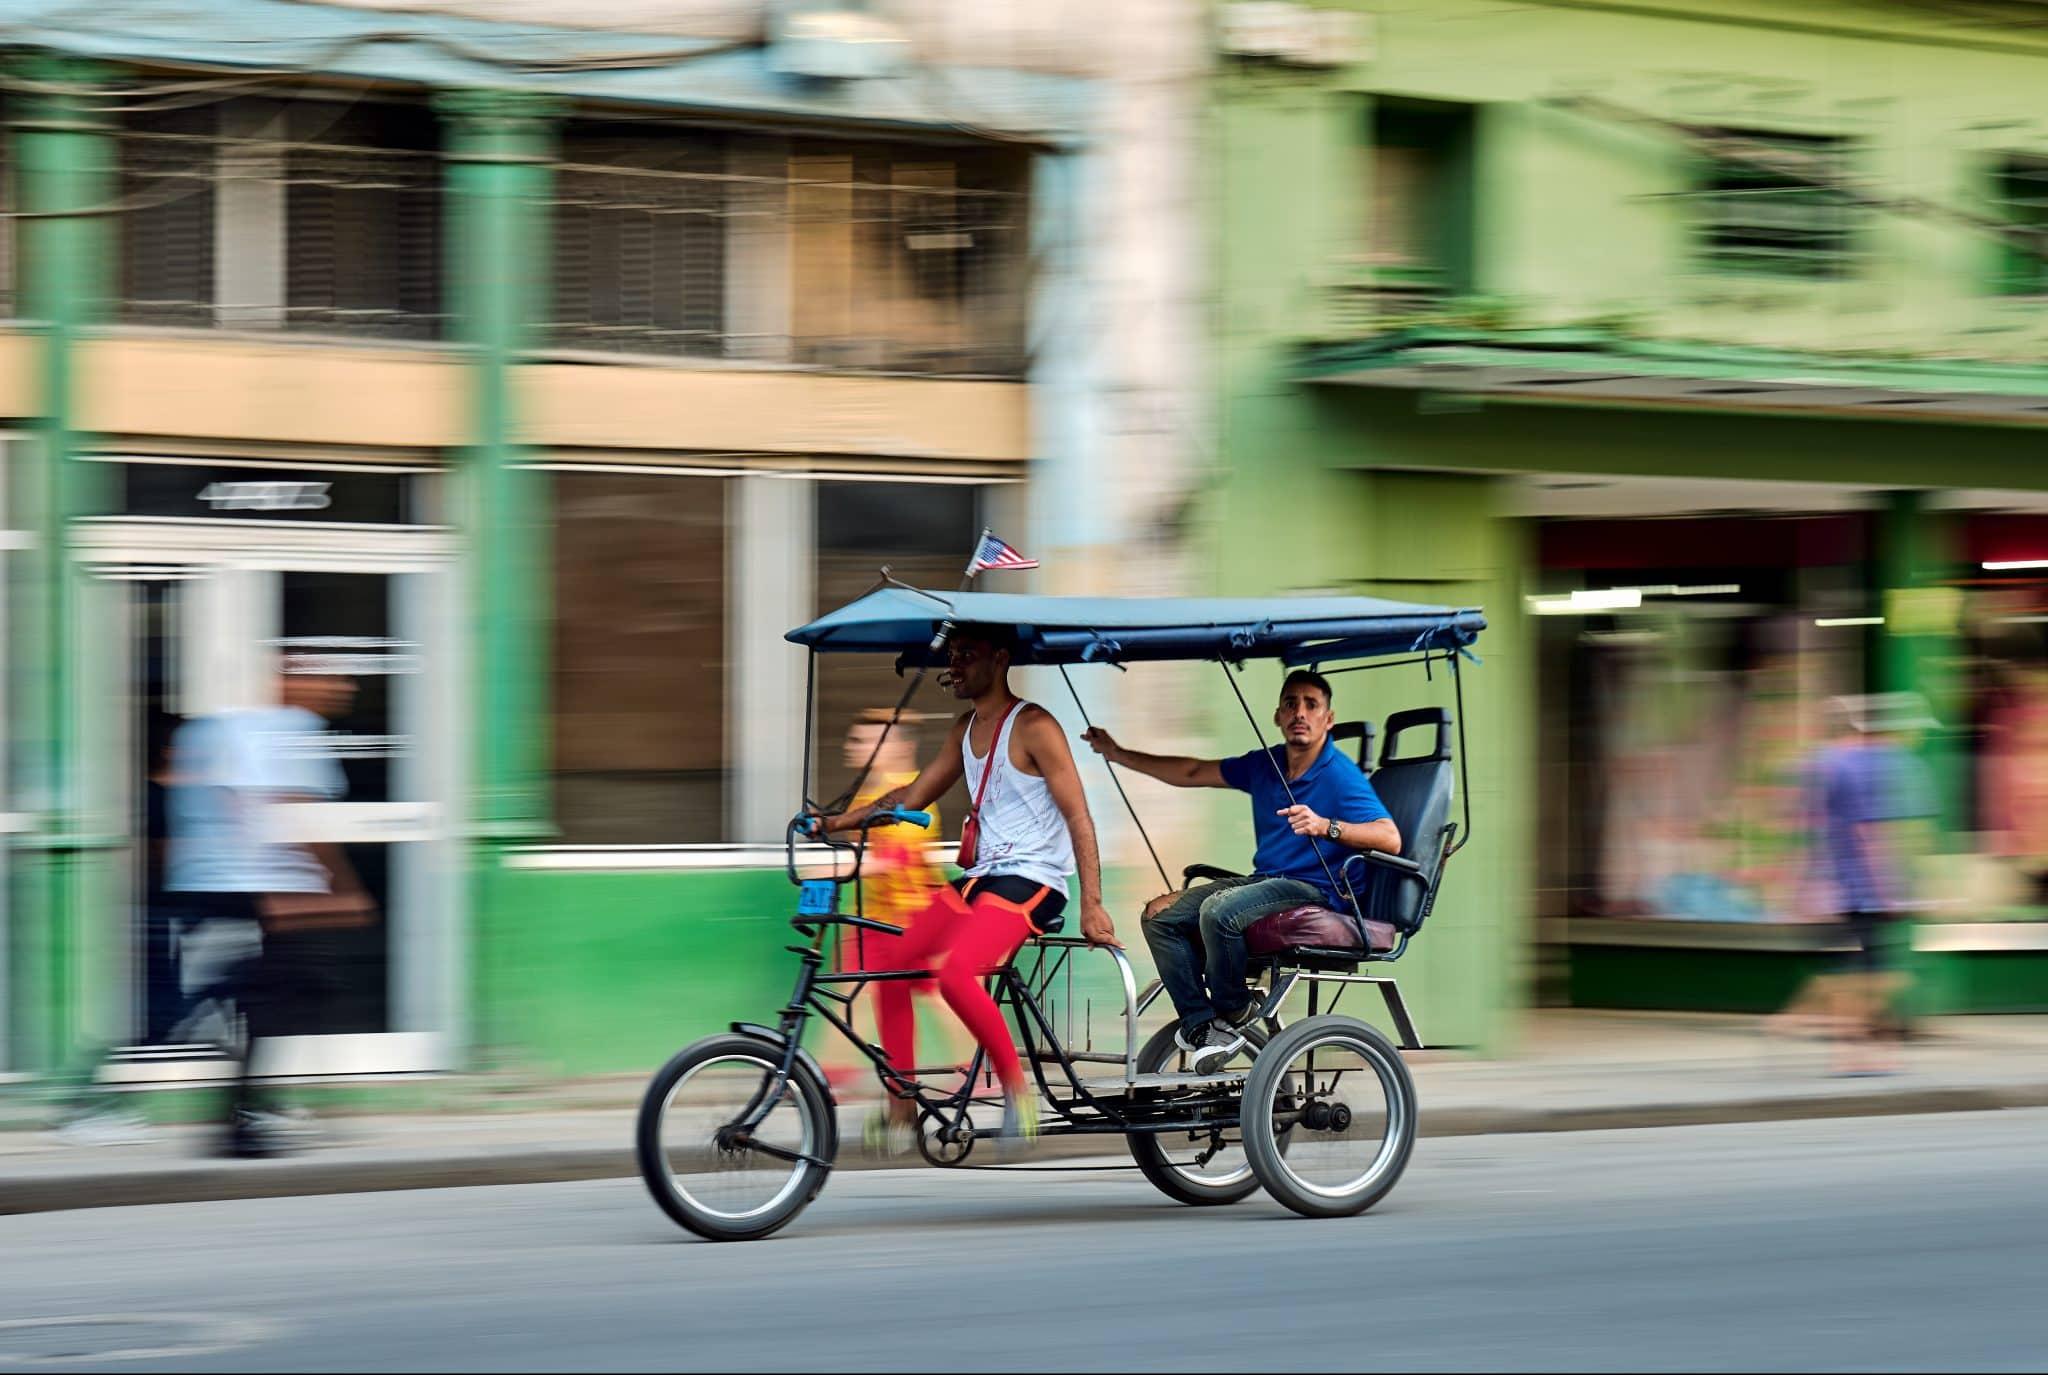 Bounding About Havana via Bicitaxi